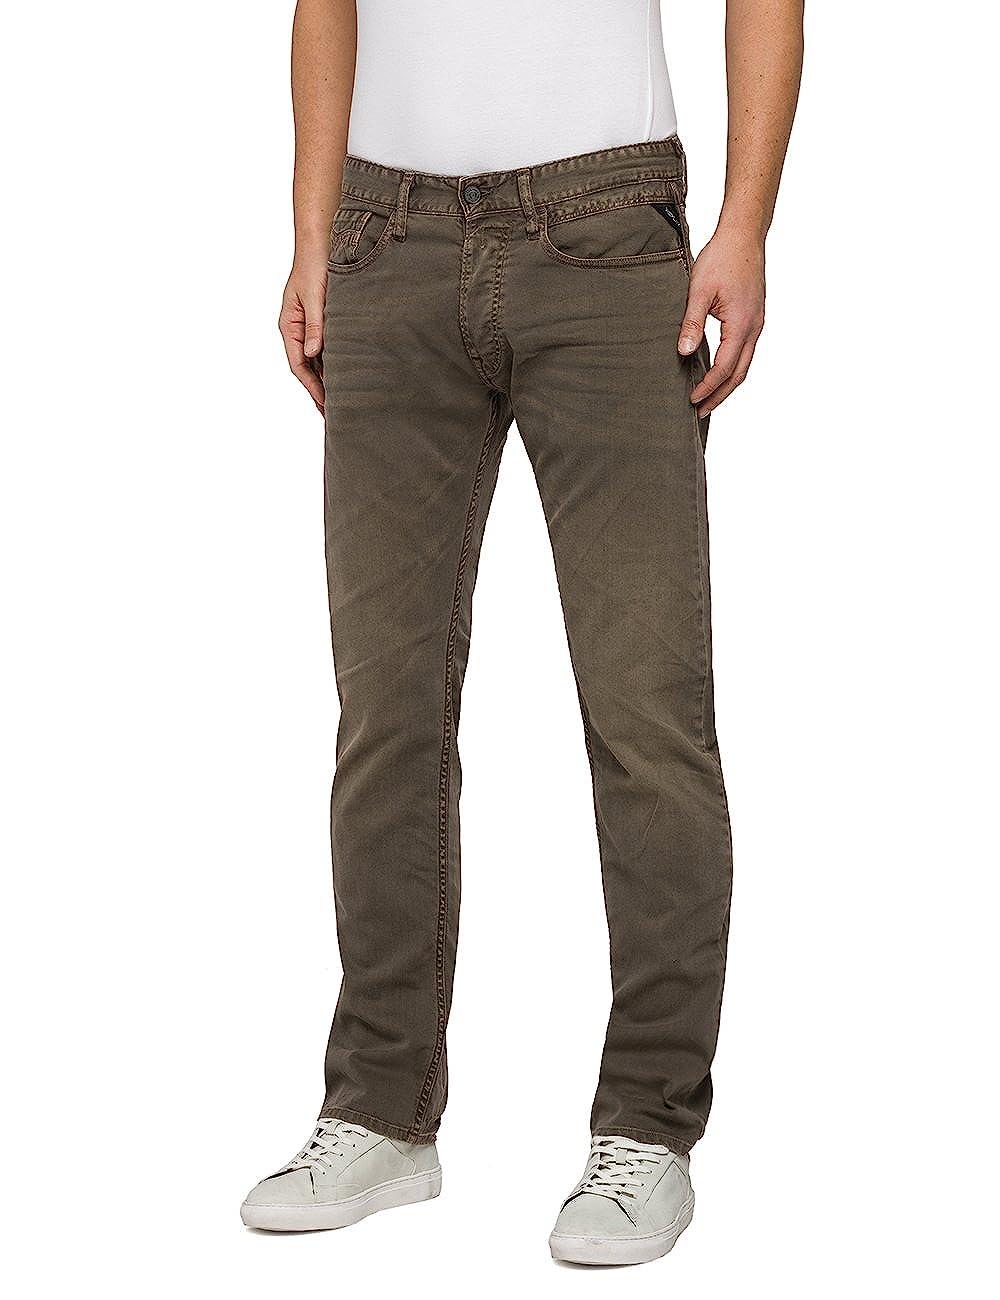 Replay Herren Newbill Straight Jeans B071CNRLW8 Jeanshosen Helle Farben Farben Farben 8288e7